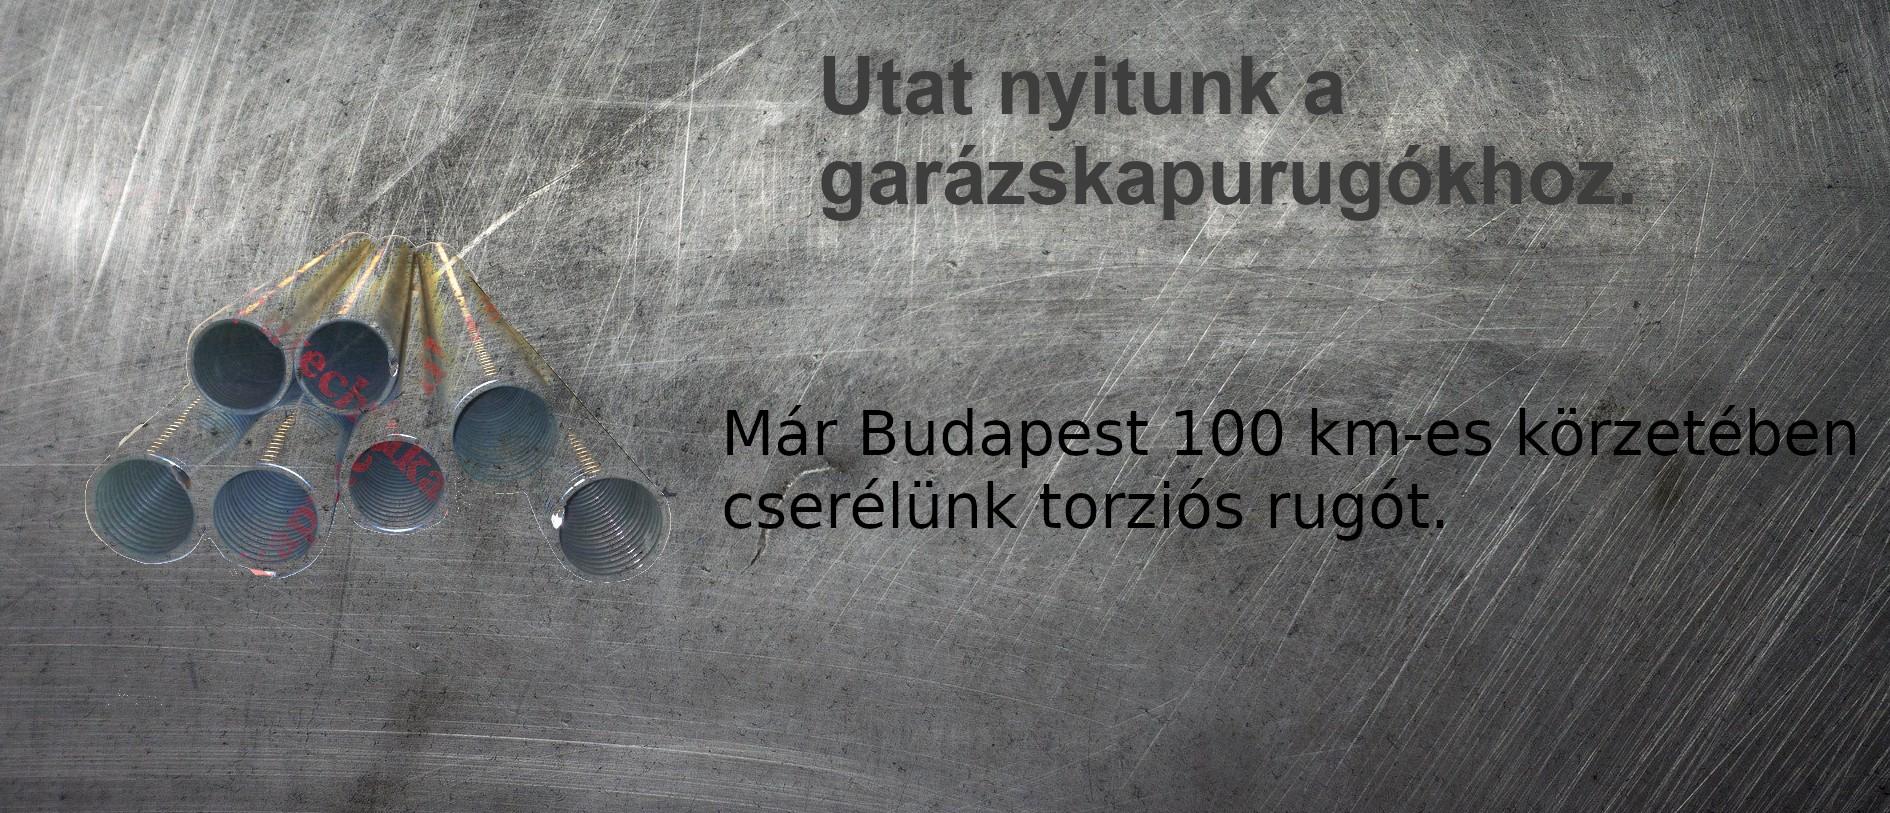 Garázskapurugók cseréje - kaputechnikaszerviz.hu